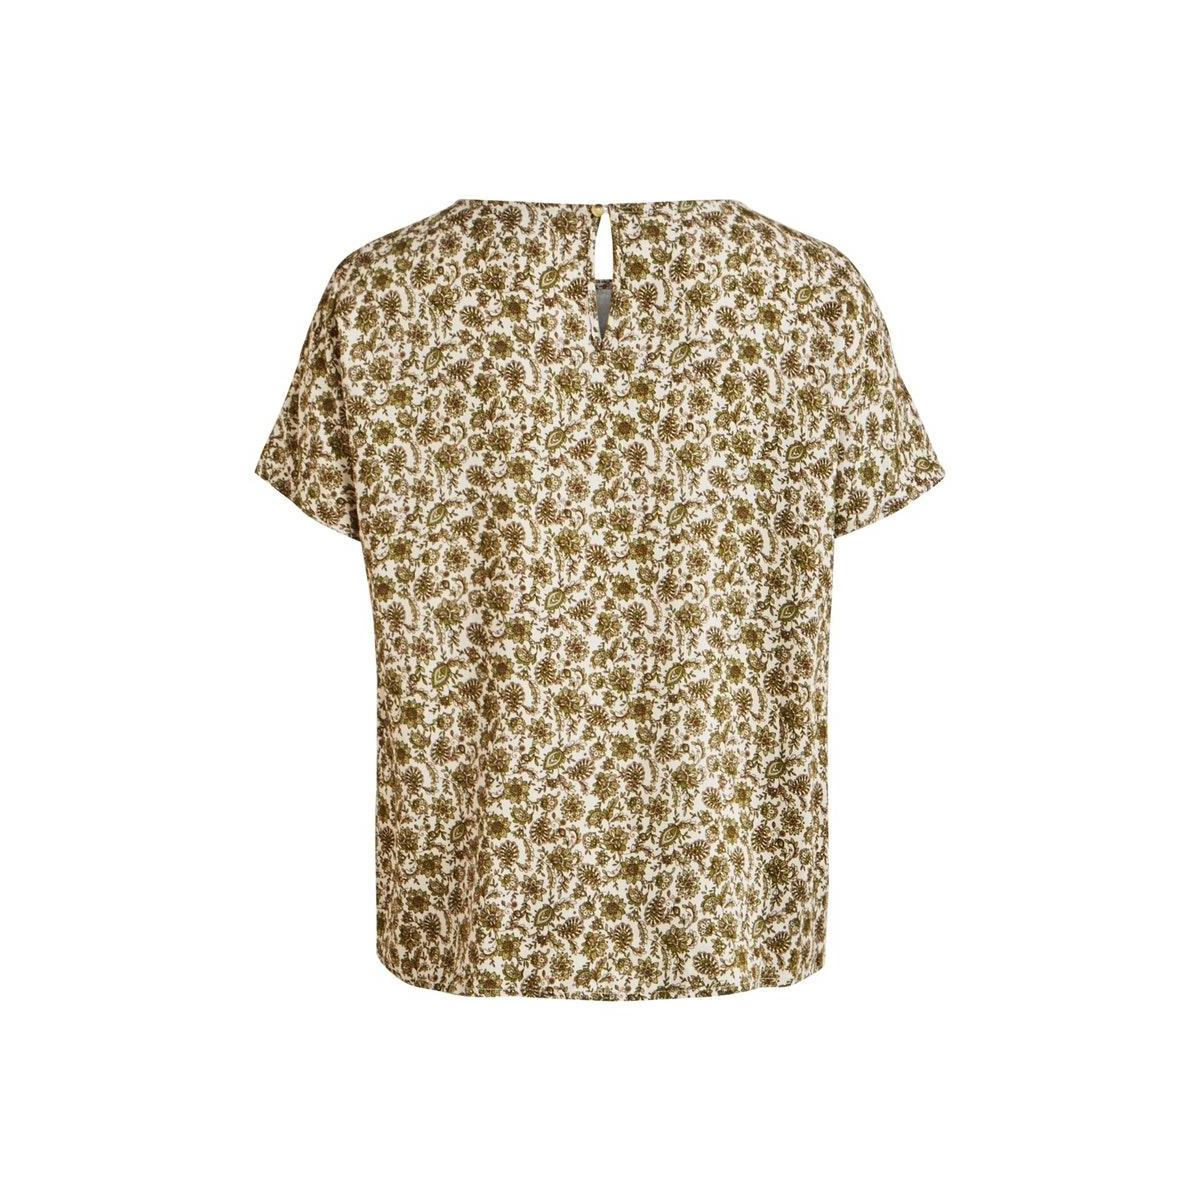 objkalila s/s urban top 108 div 23032531 object t-shirt gardenia/kalila flo